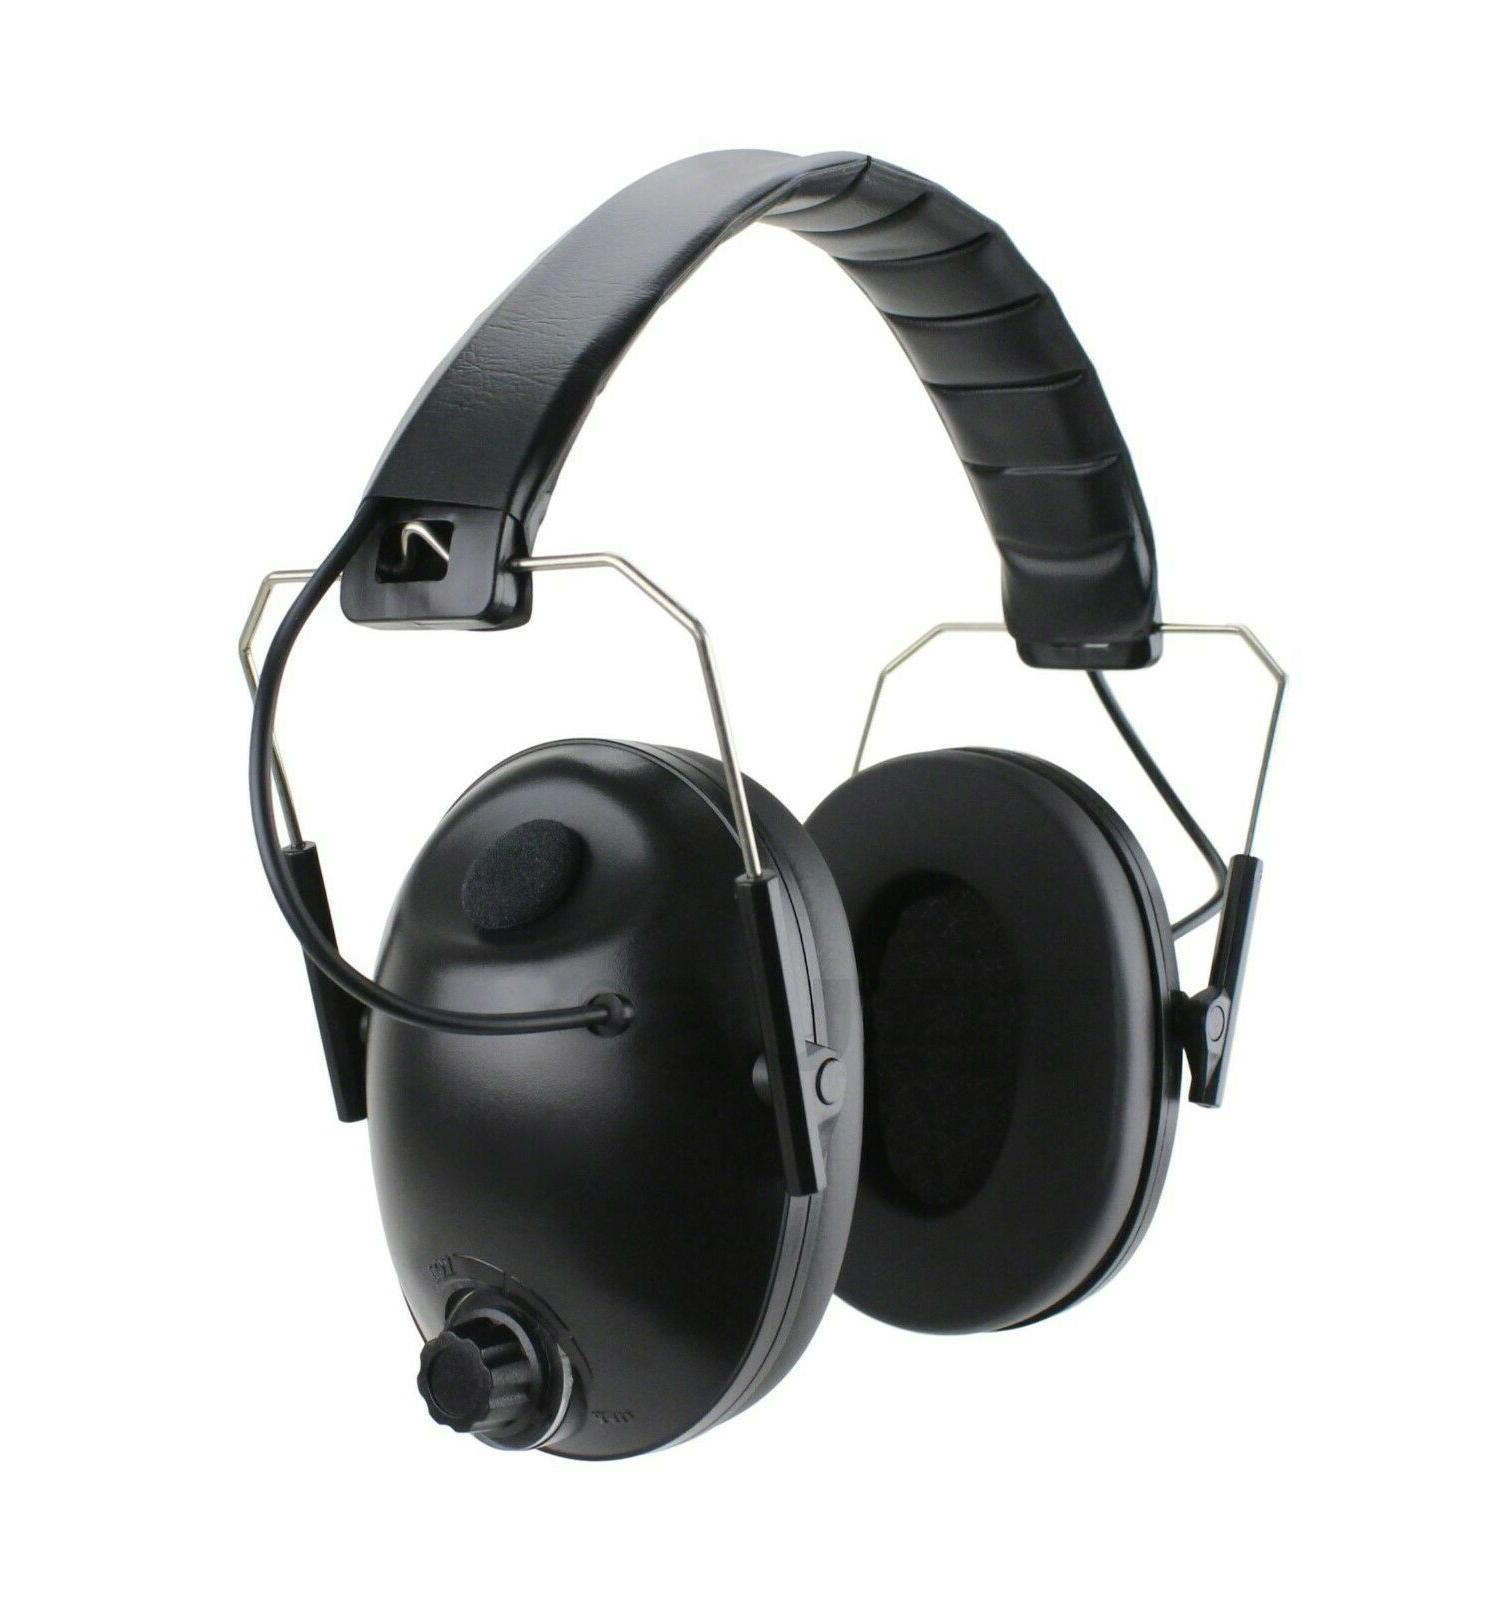 ELECTRONIC SMART NOISE CANCELING EARMUFF REDUCTION EAR & EYE